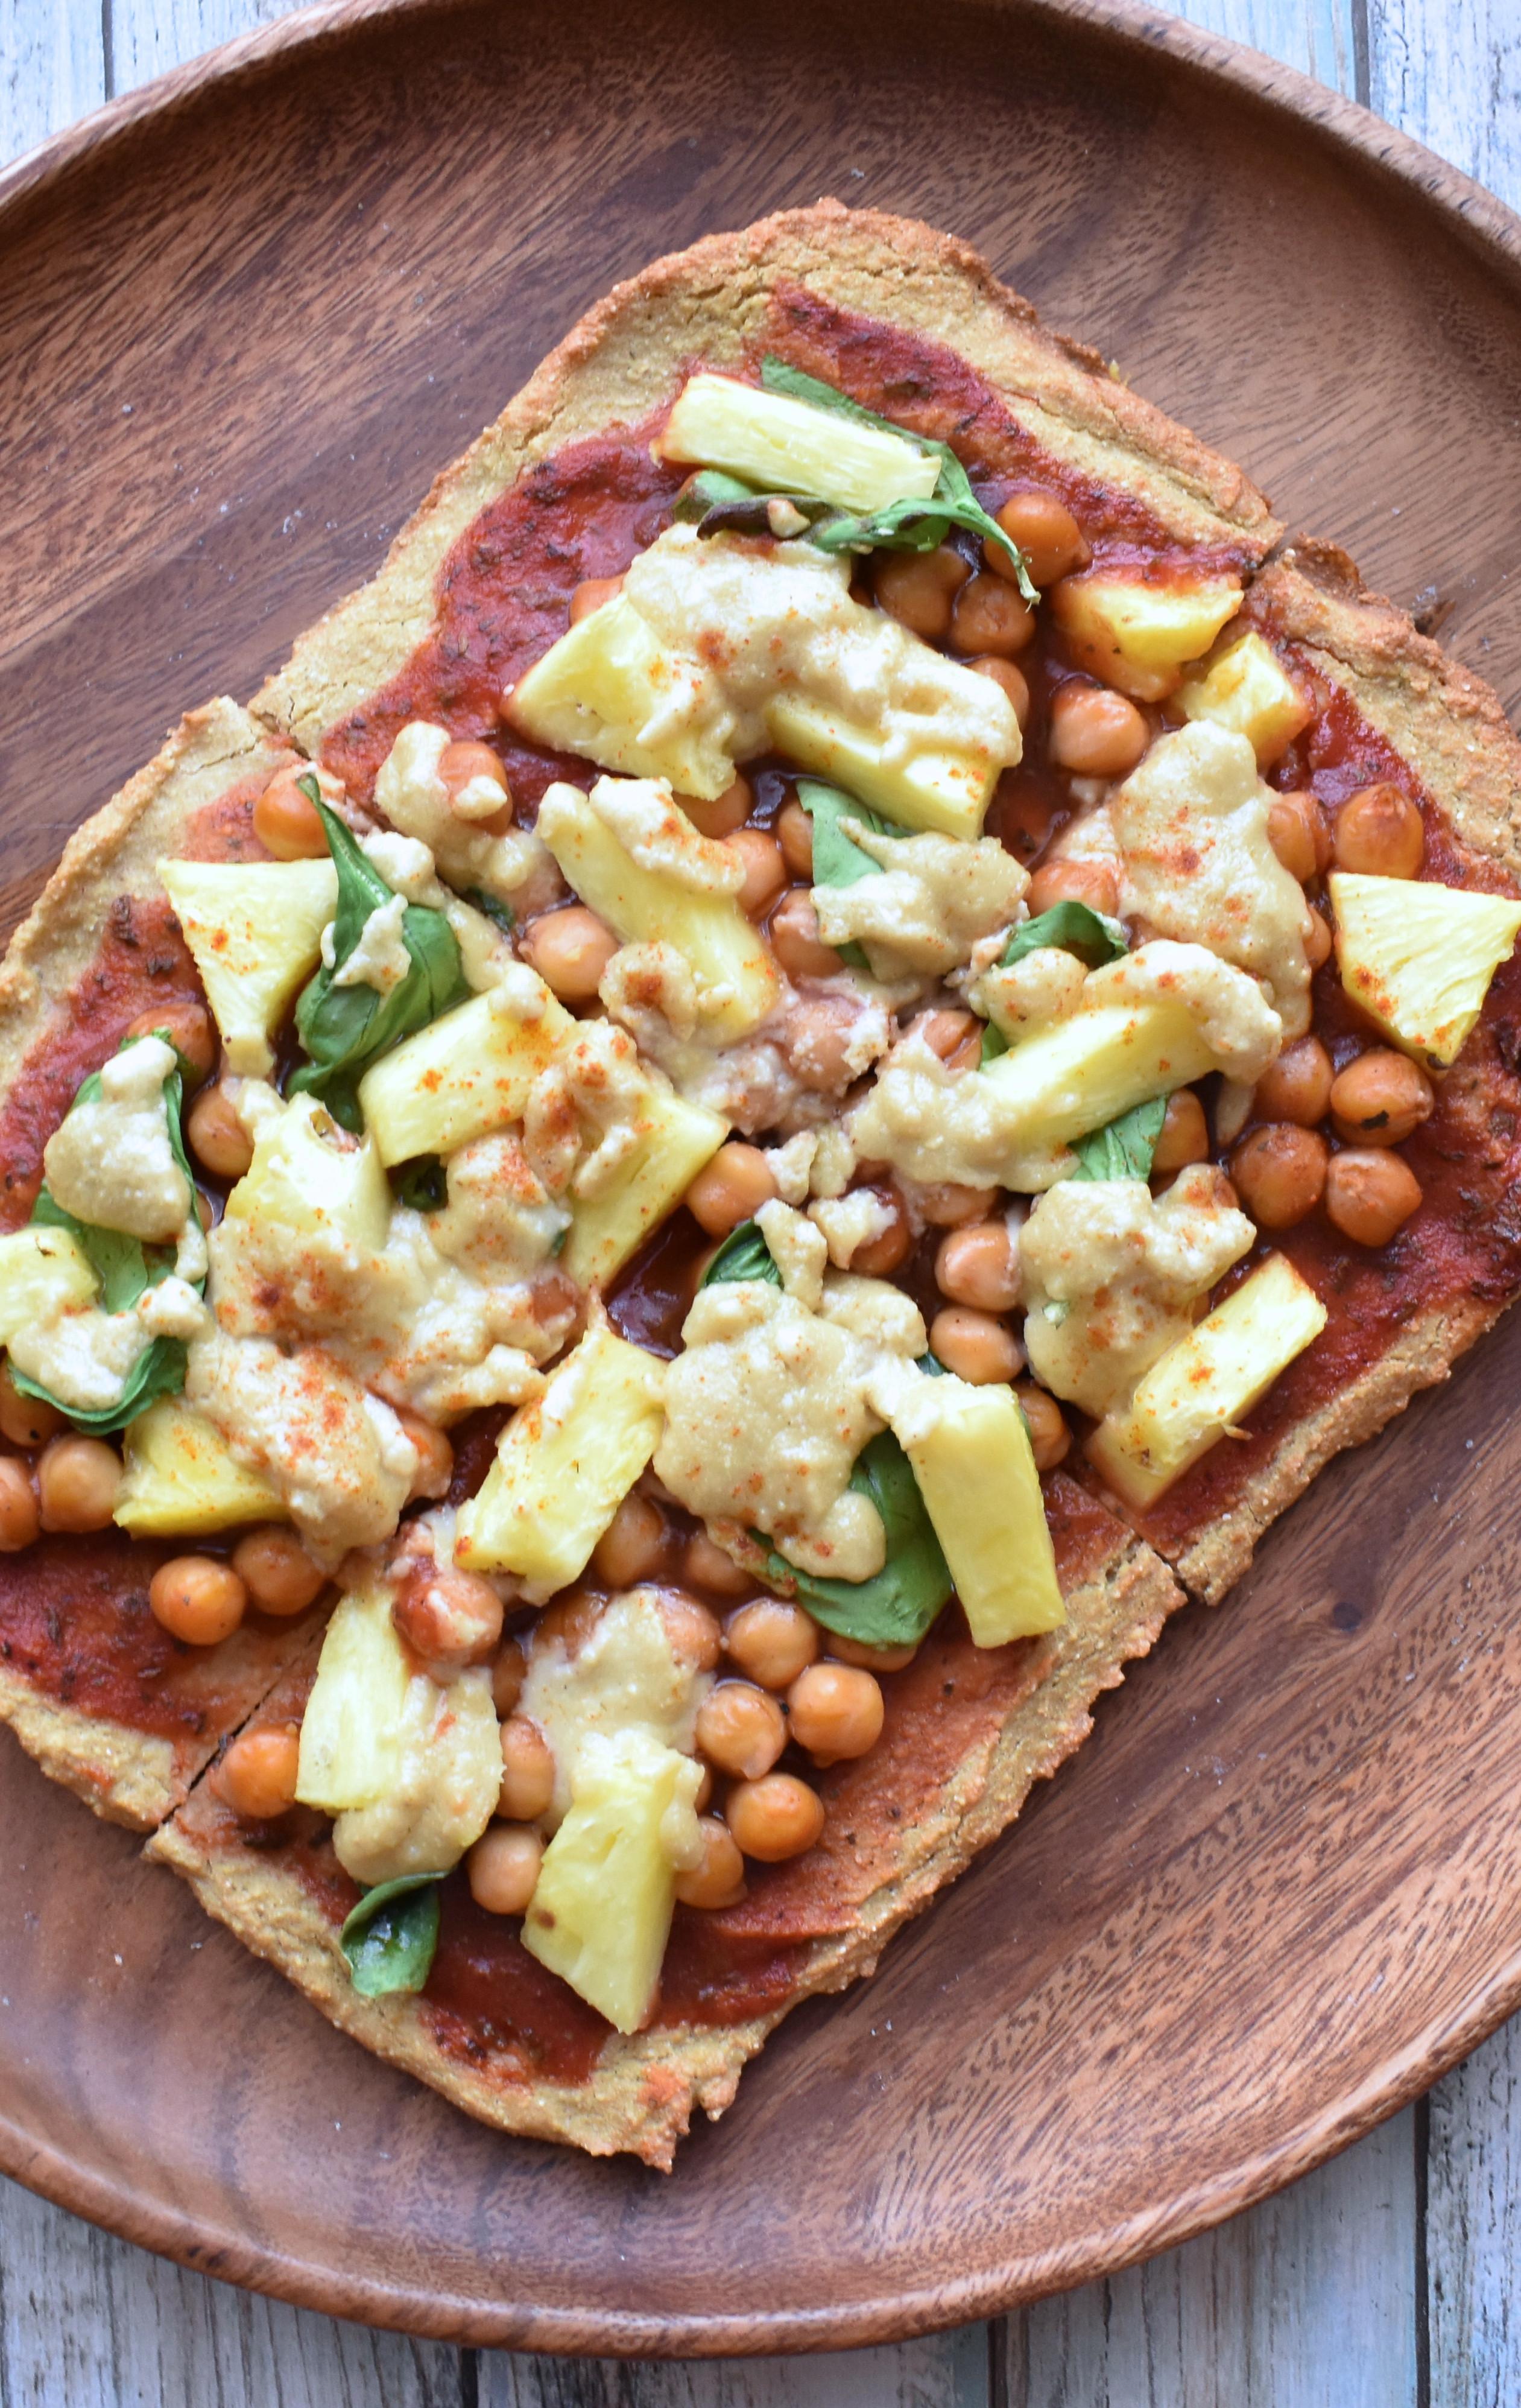 Healthy Pizza Dough Recipe  Easy & Healthy Pizza Crust Recipe Gluten Free & Vegan